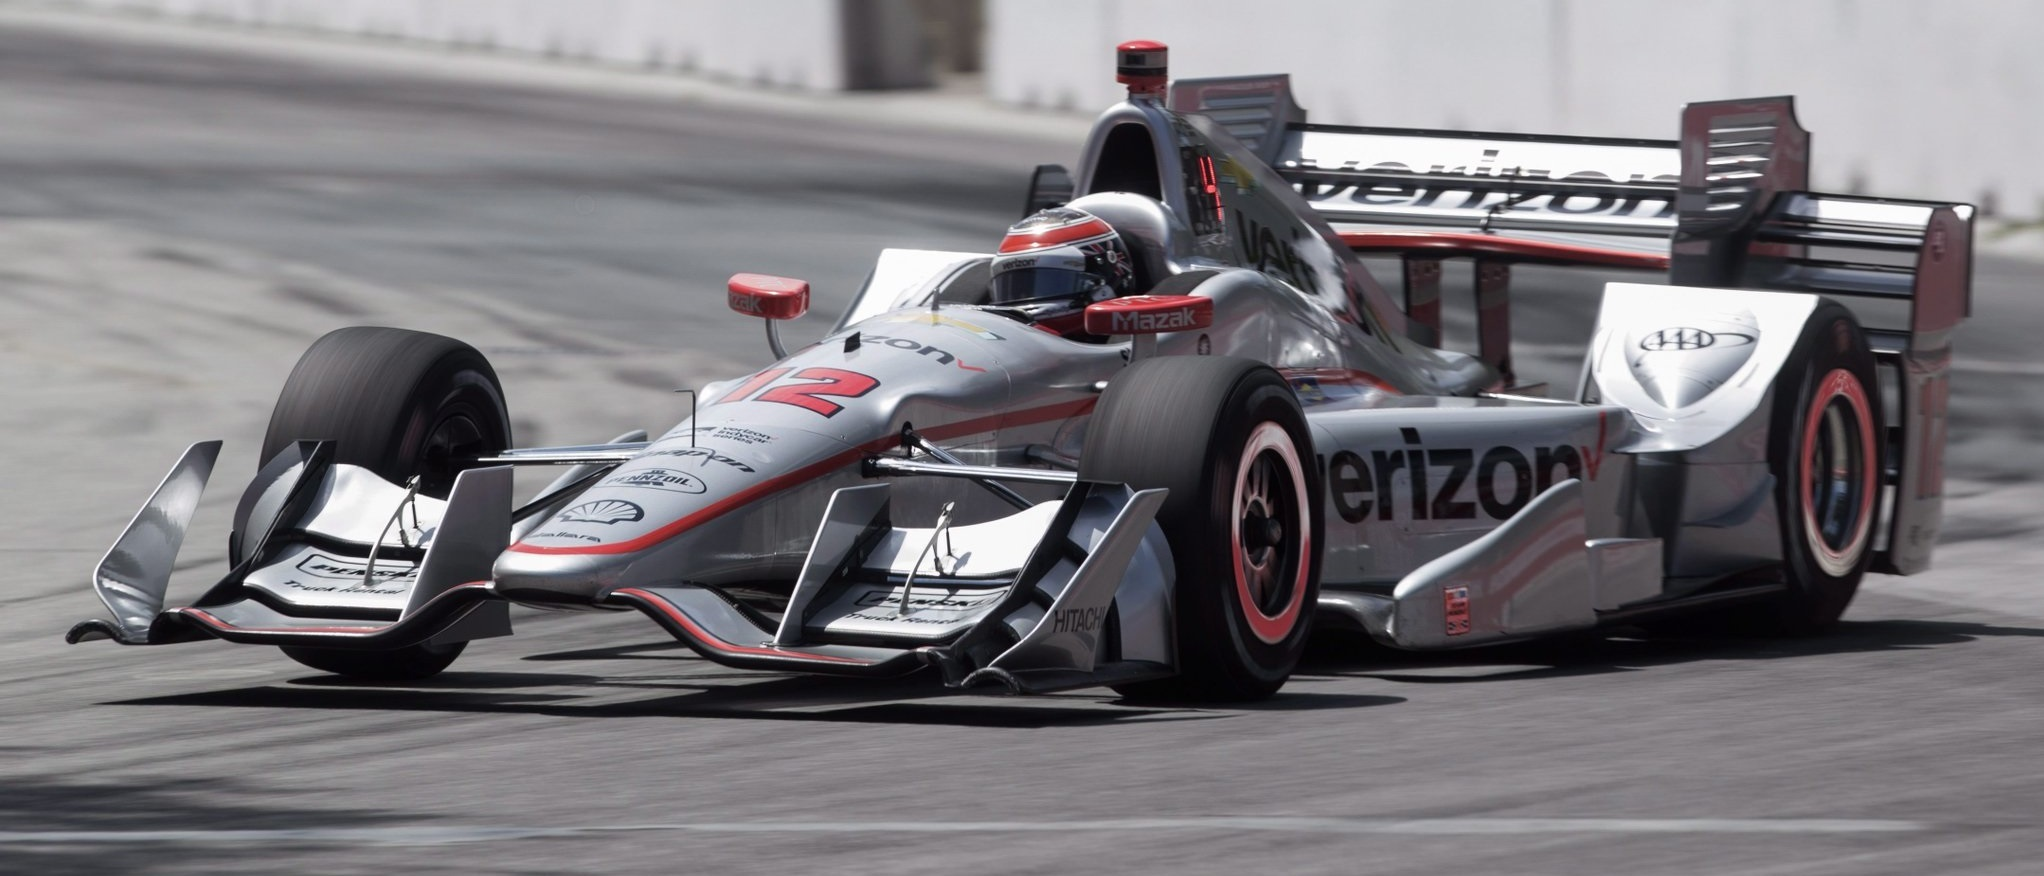 Will Power Toronto 2016 IndyCar